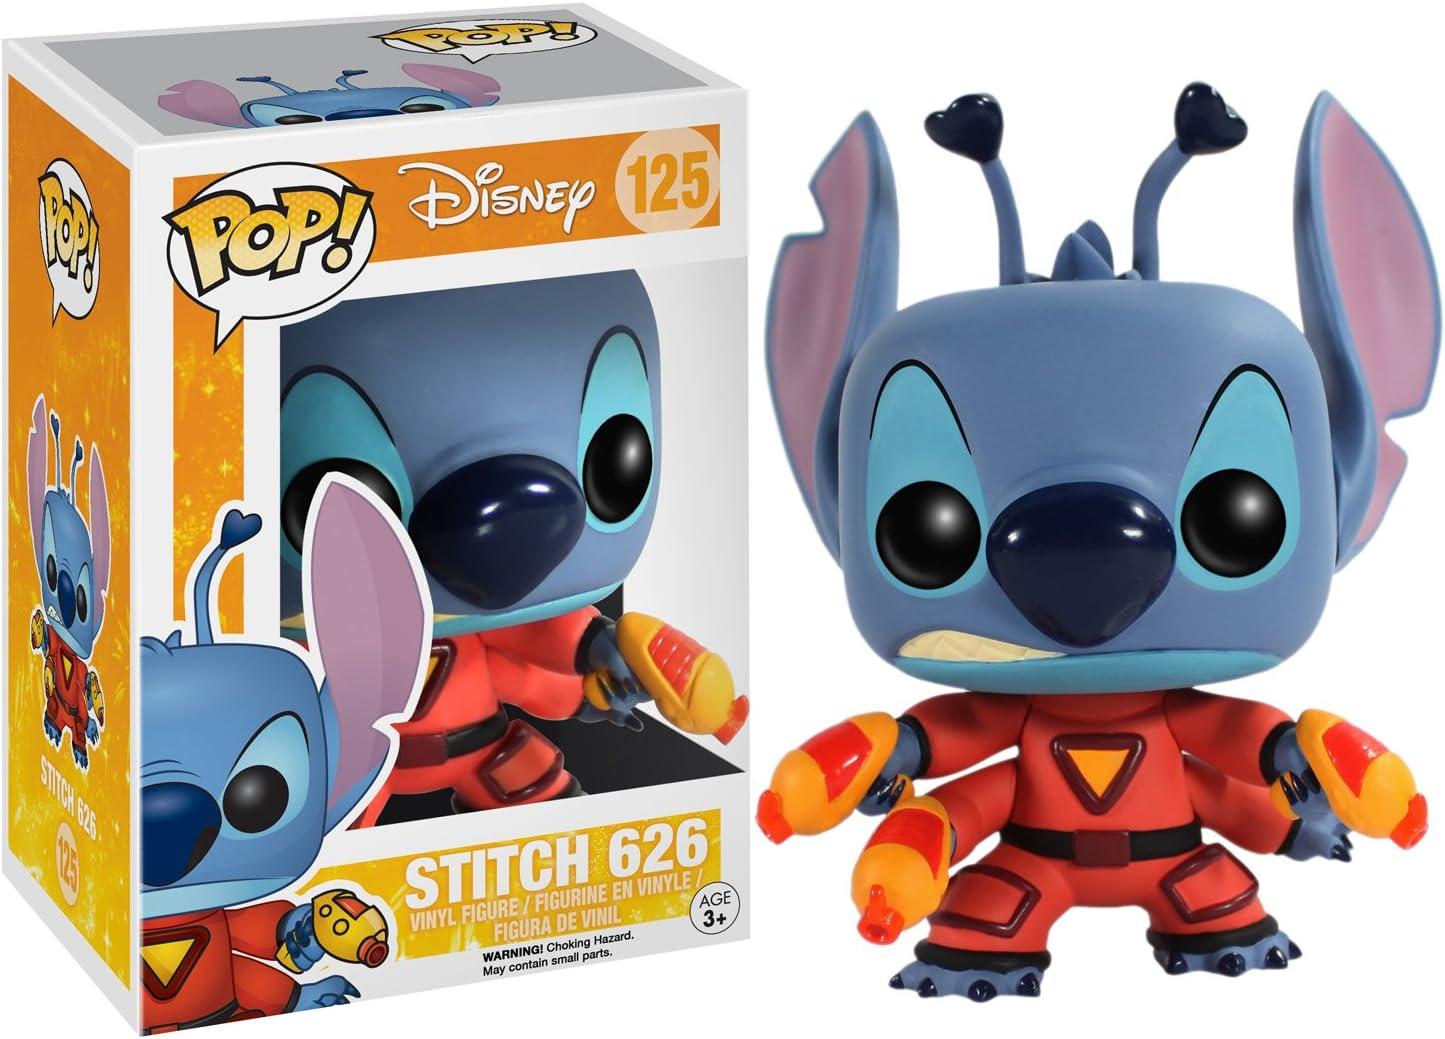 Amazon.com: Figura de vinilo Funko POP de Disney: Stitch 626 ...